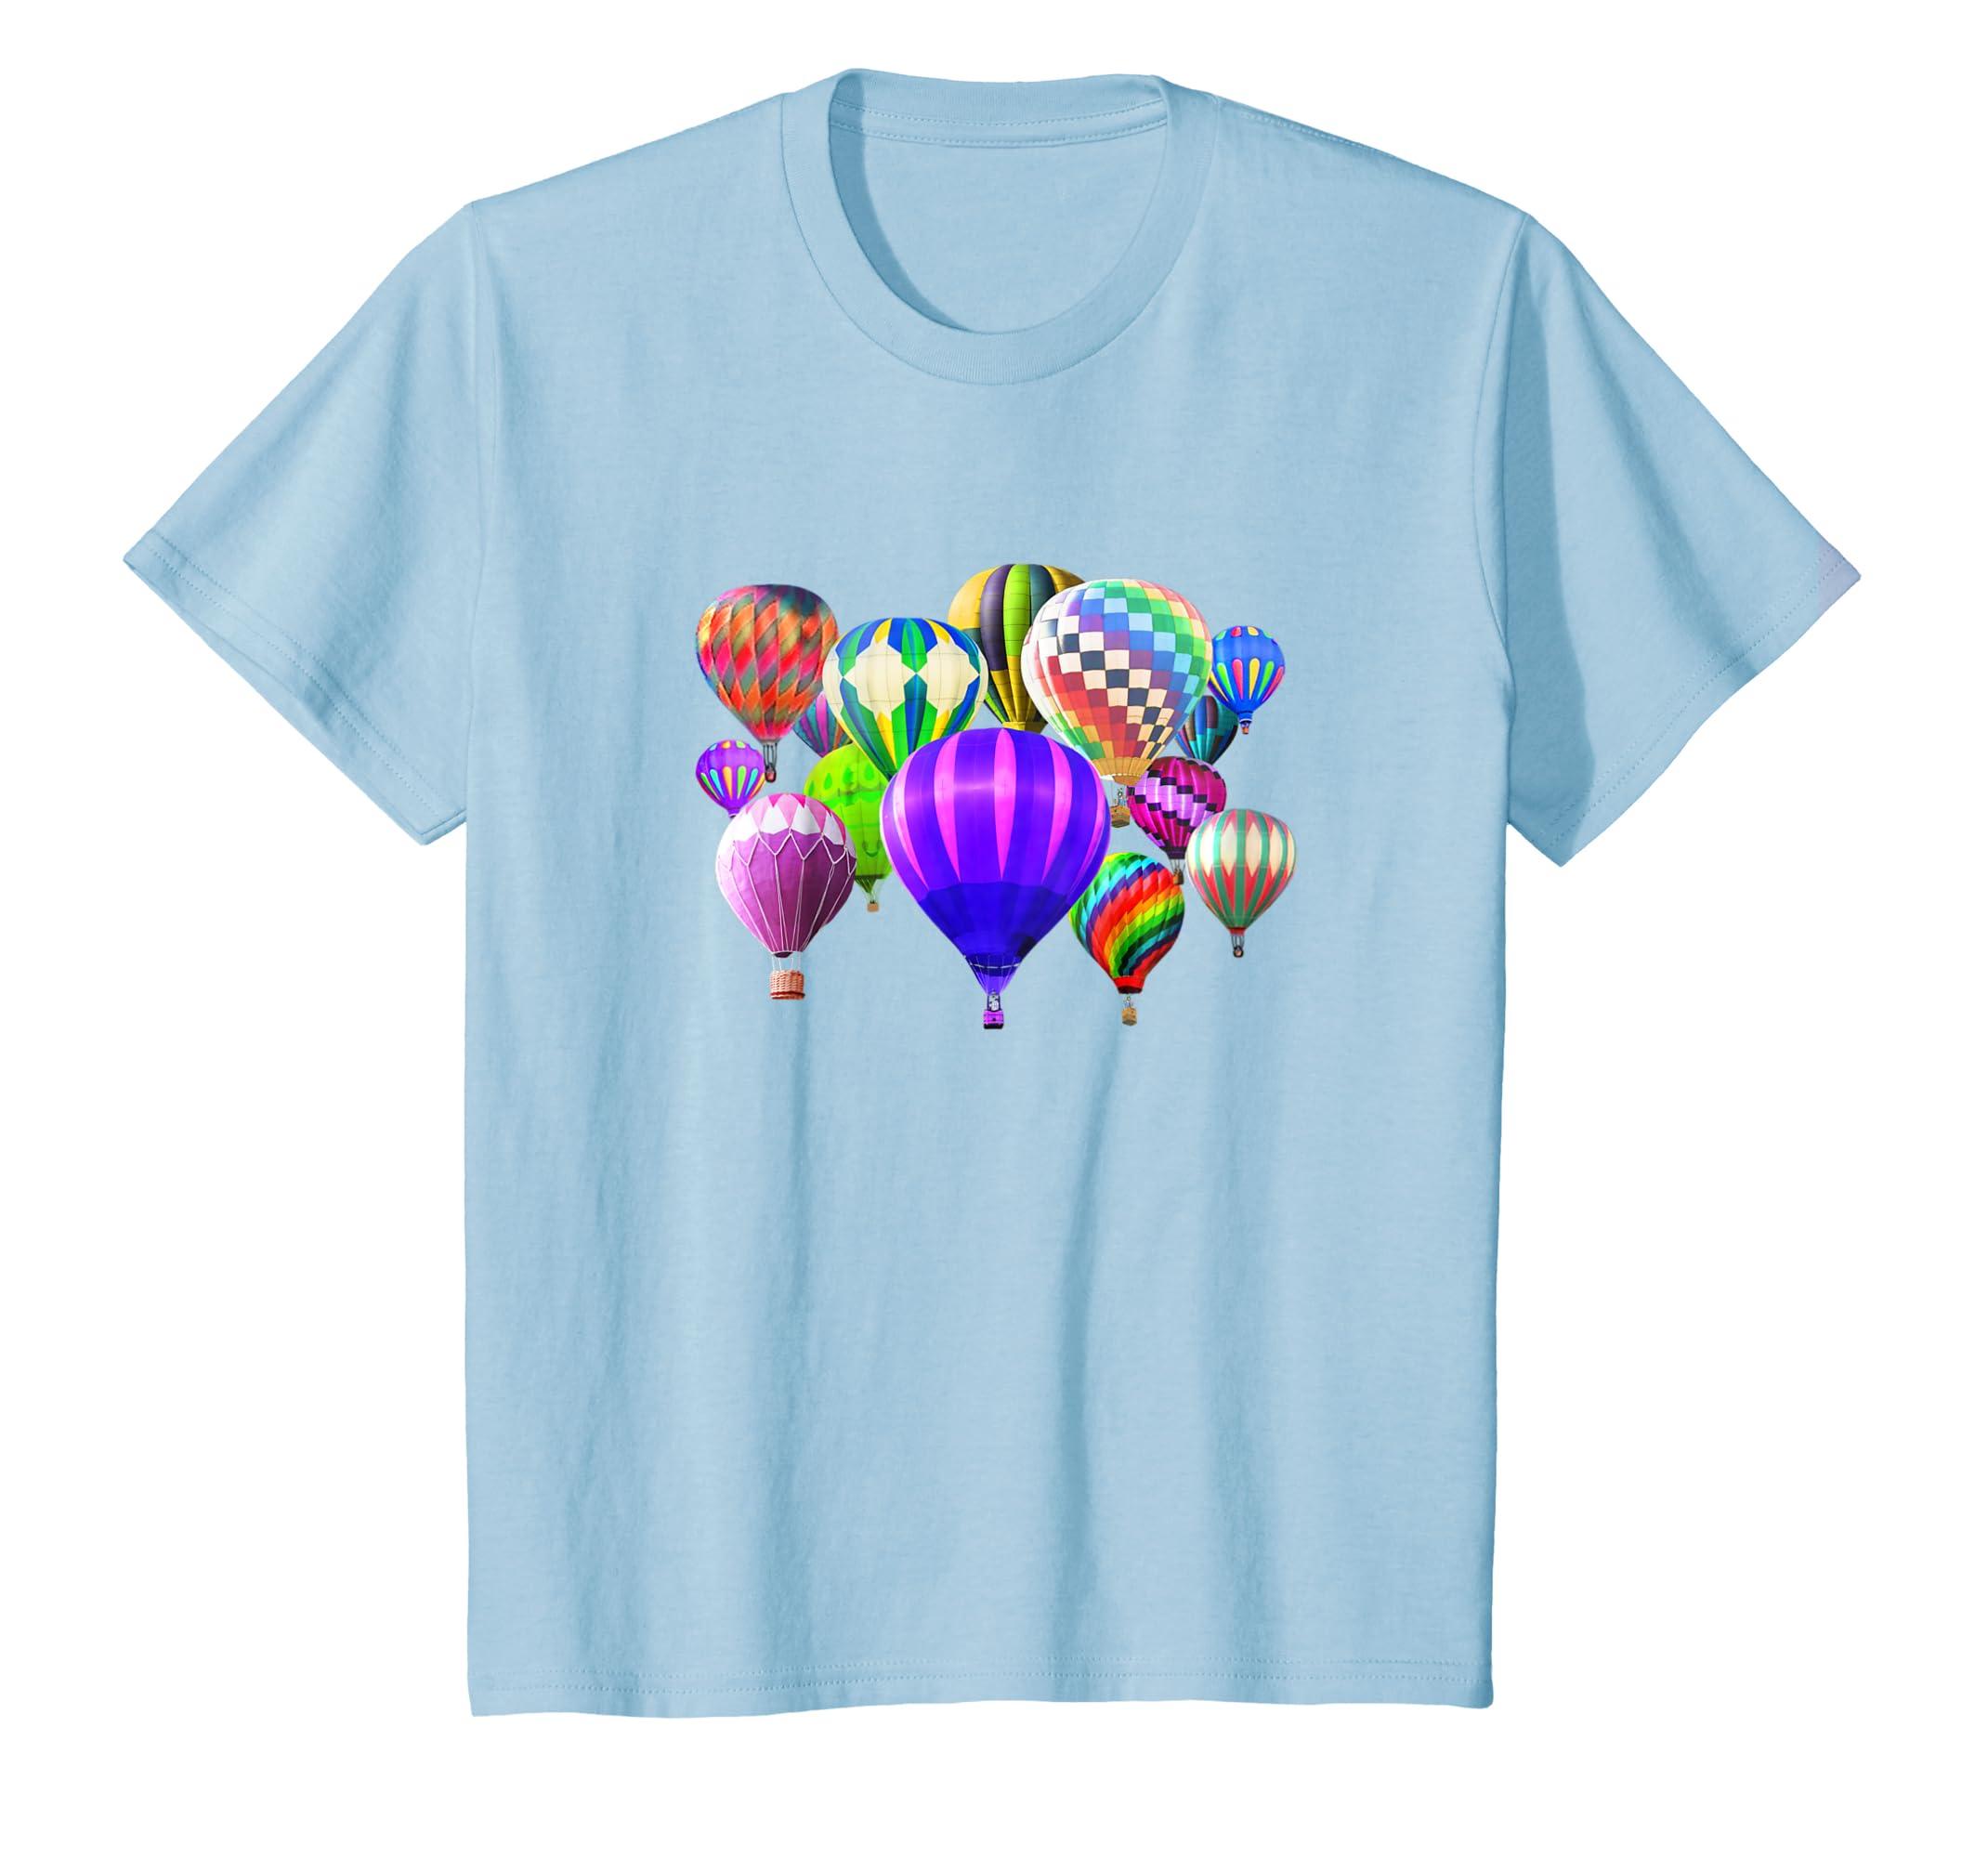 5b0a66dc9dc3e Amazon.com: Hot Air Balloon T-Shirt Group Riding Festival: Clothing